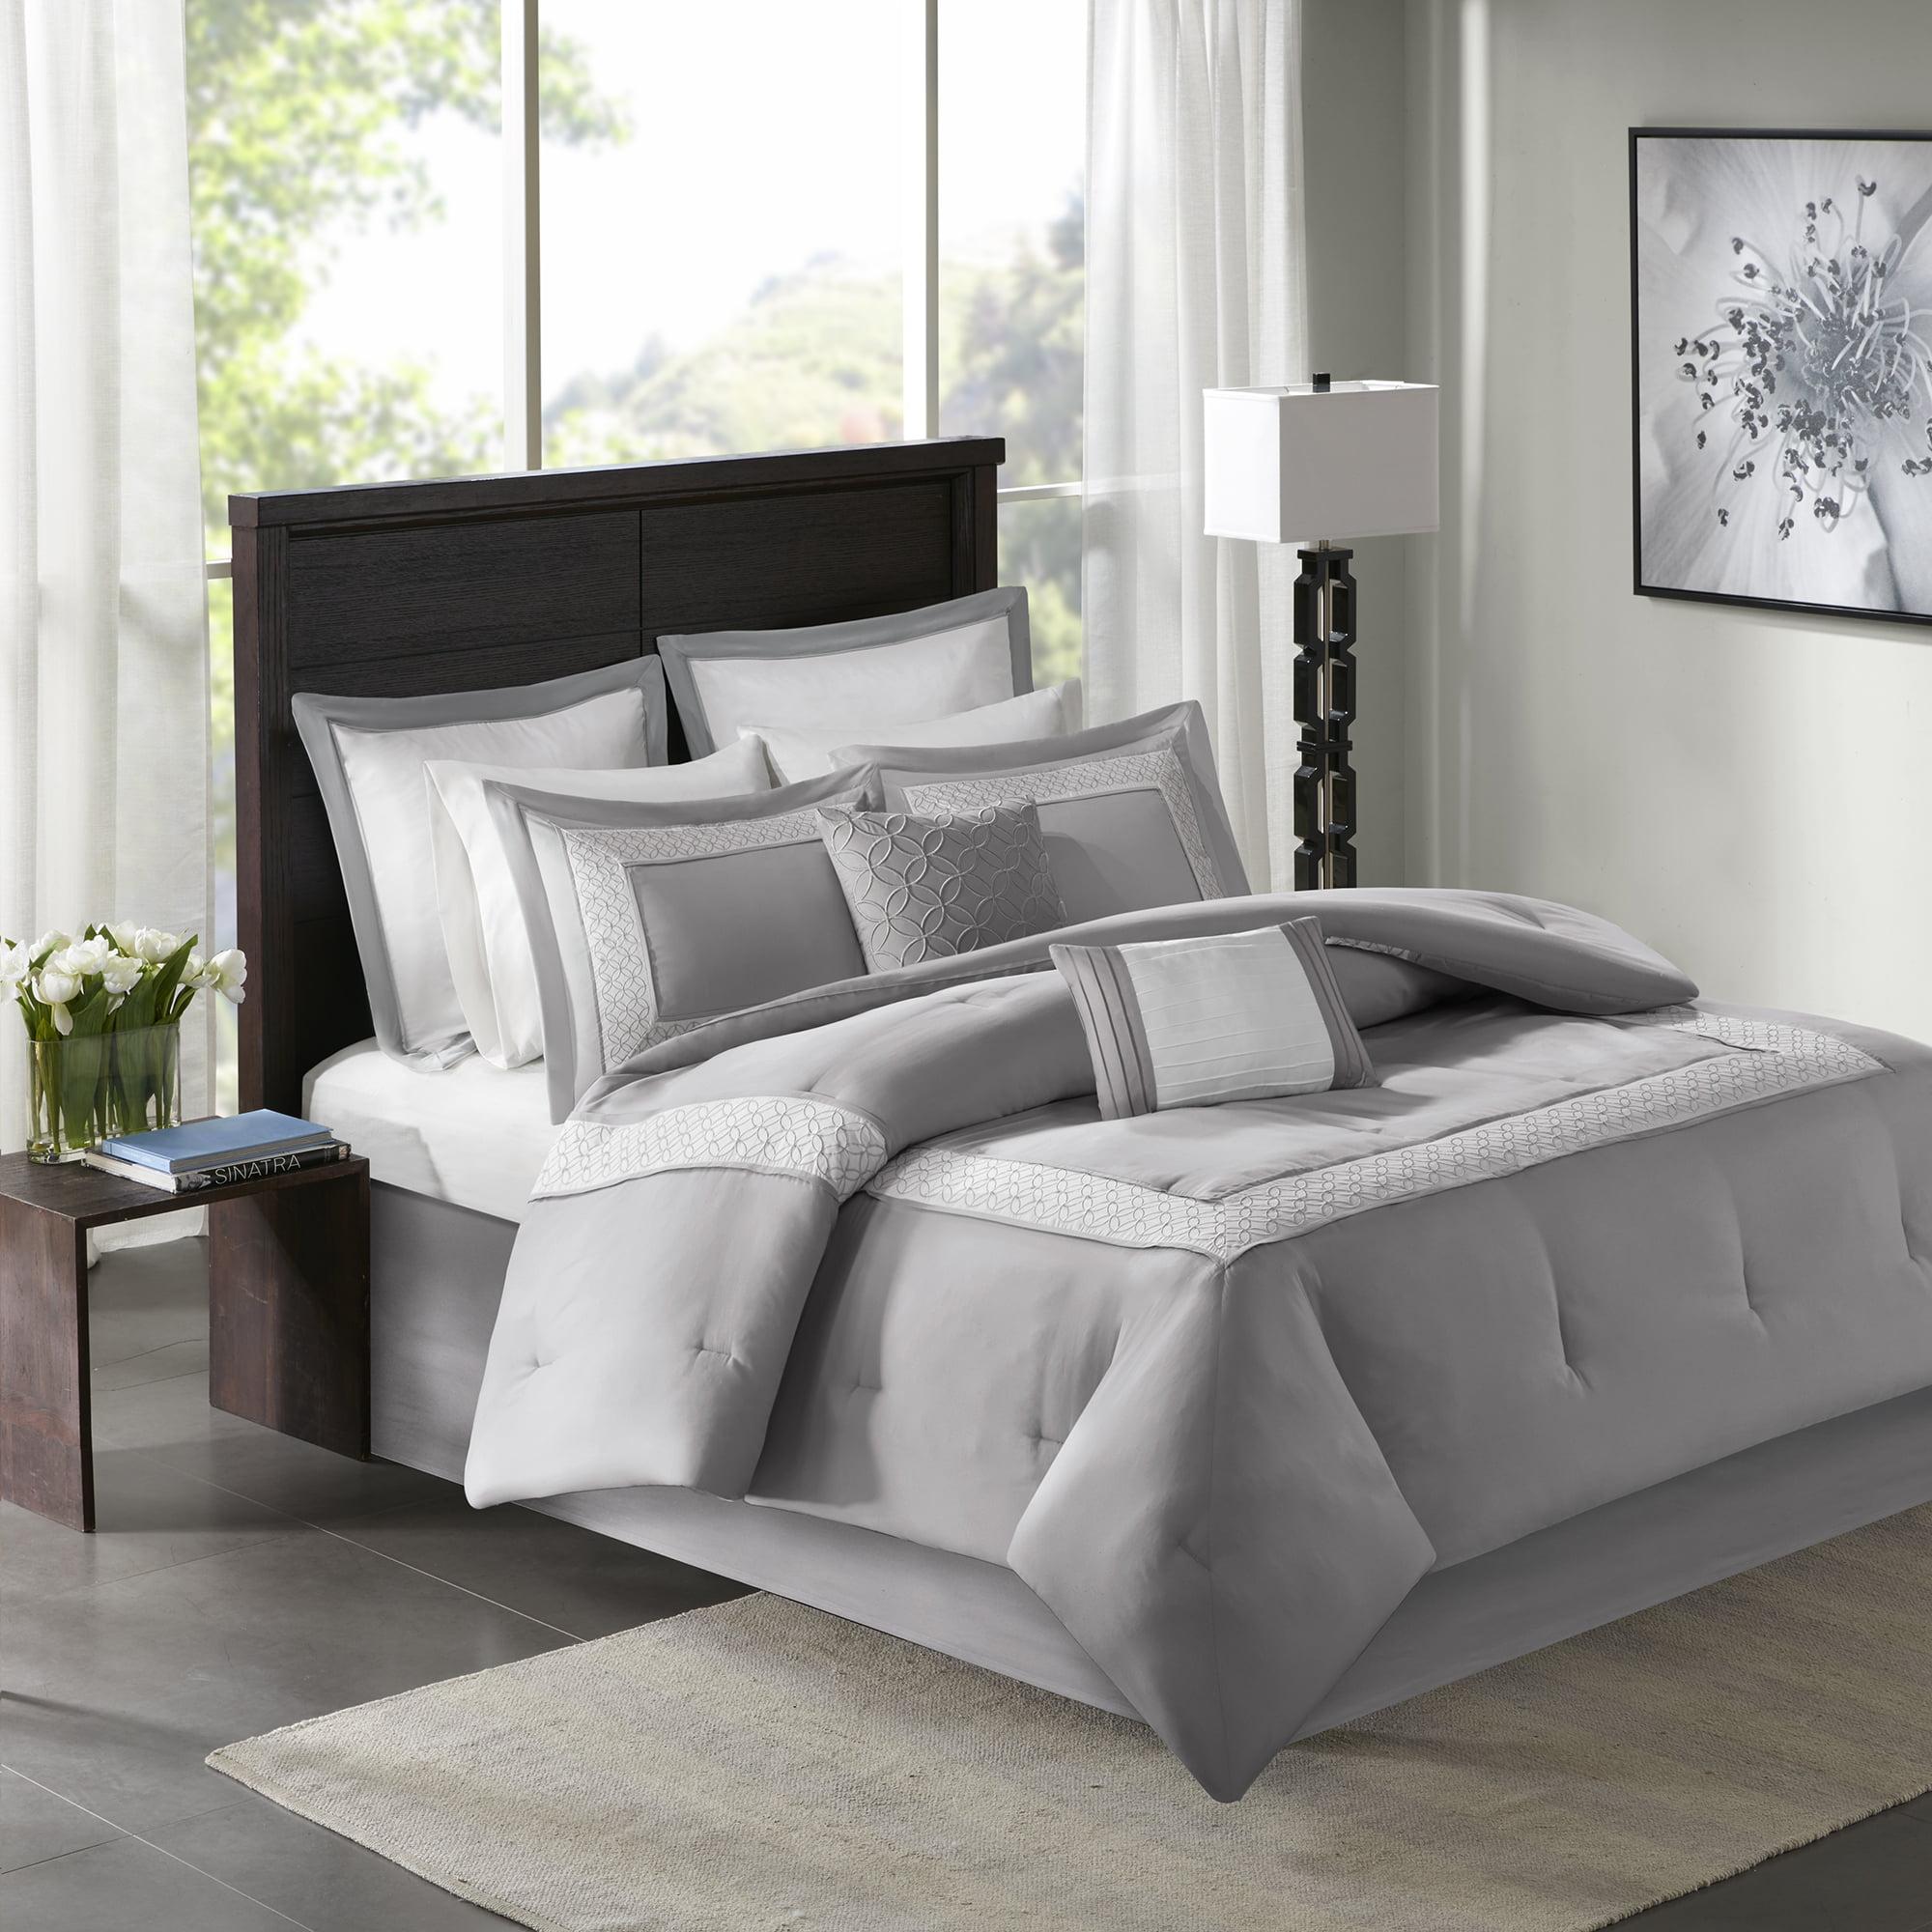 Home Essence Heritage 8 Piece Comforter Bedding Set with Bedskirt